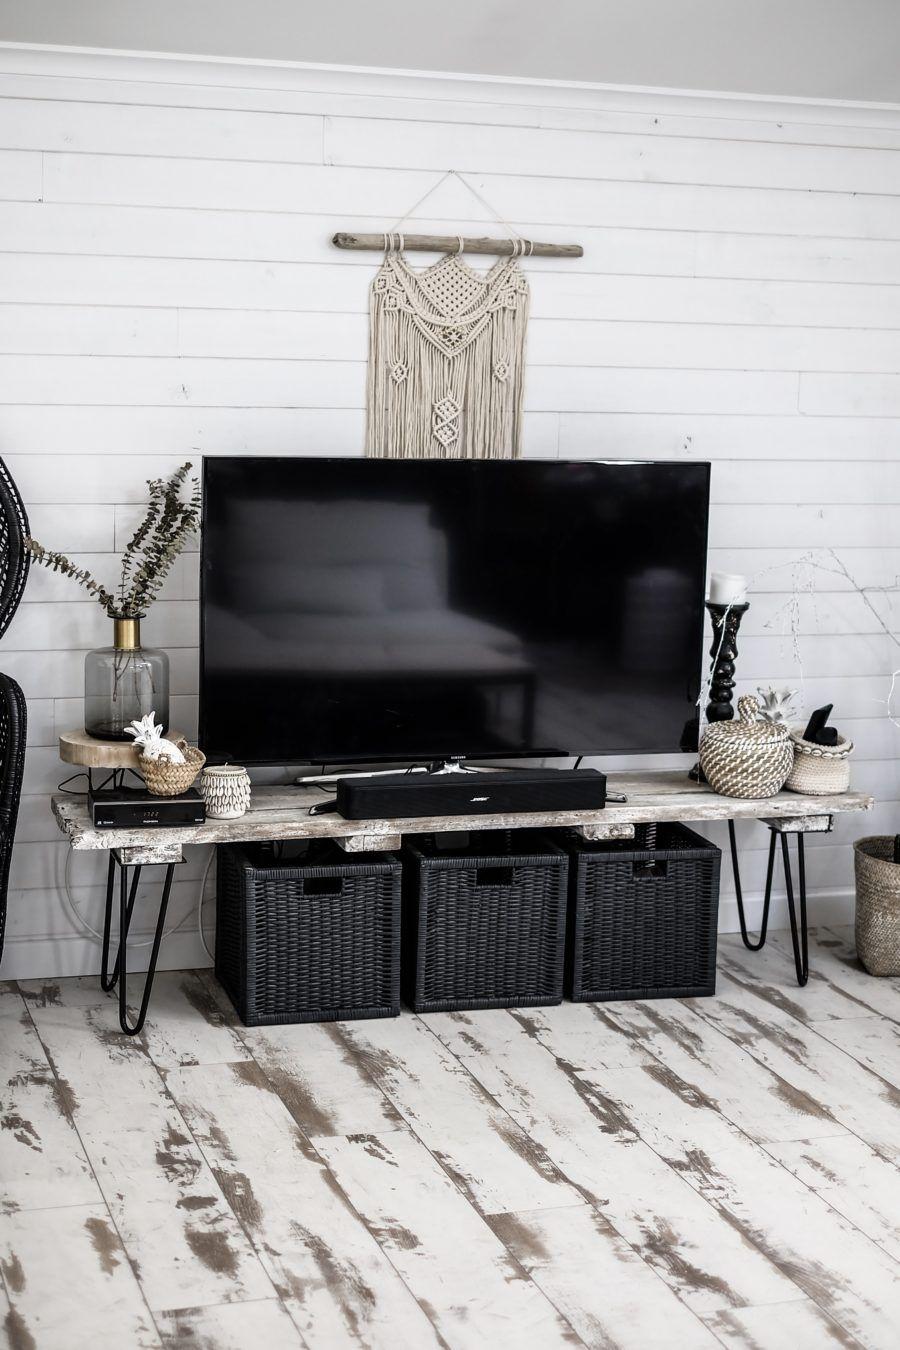 100 Incroyable Idées Idee Deco Meuble Tv